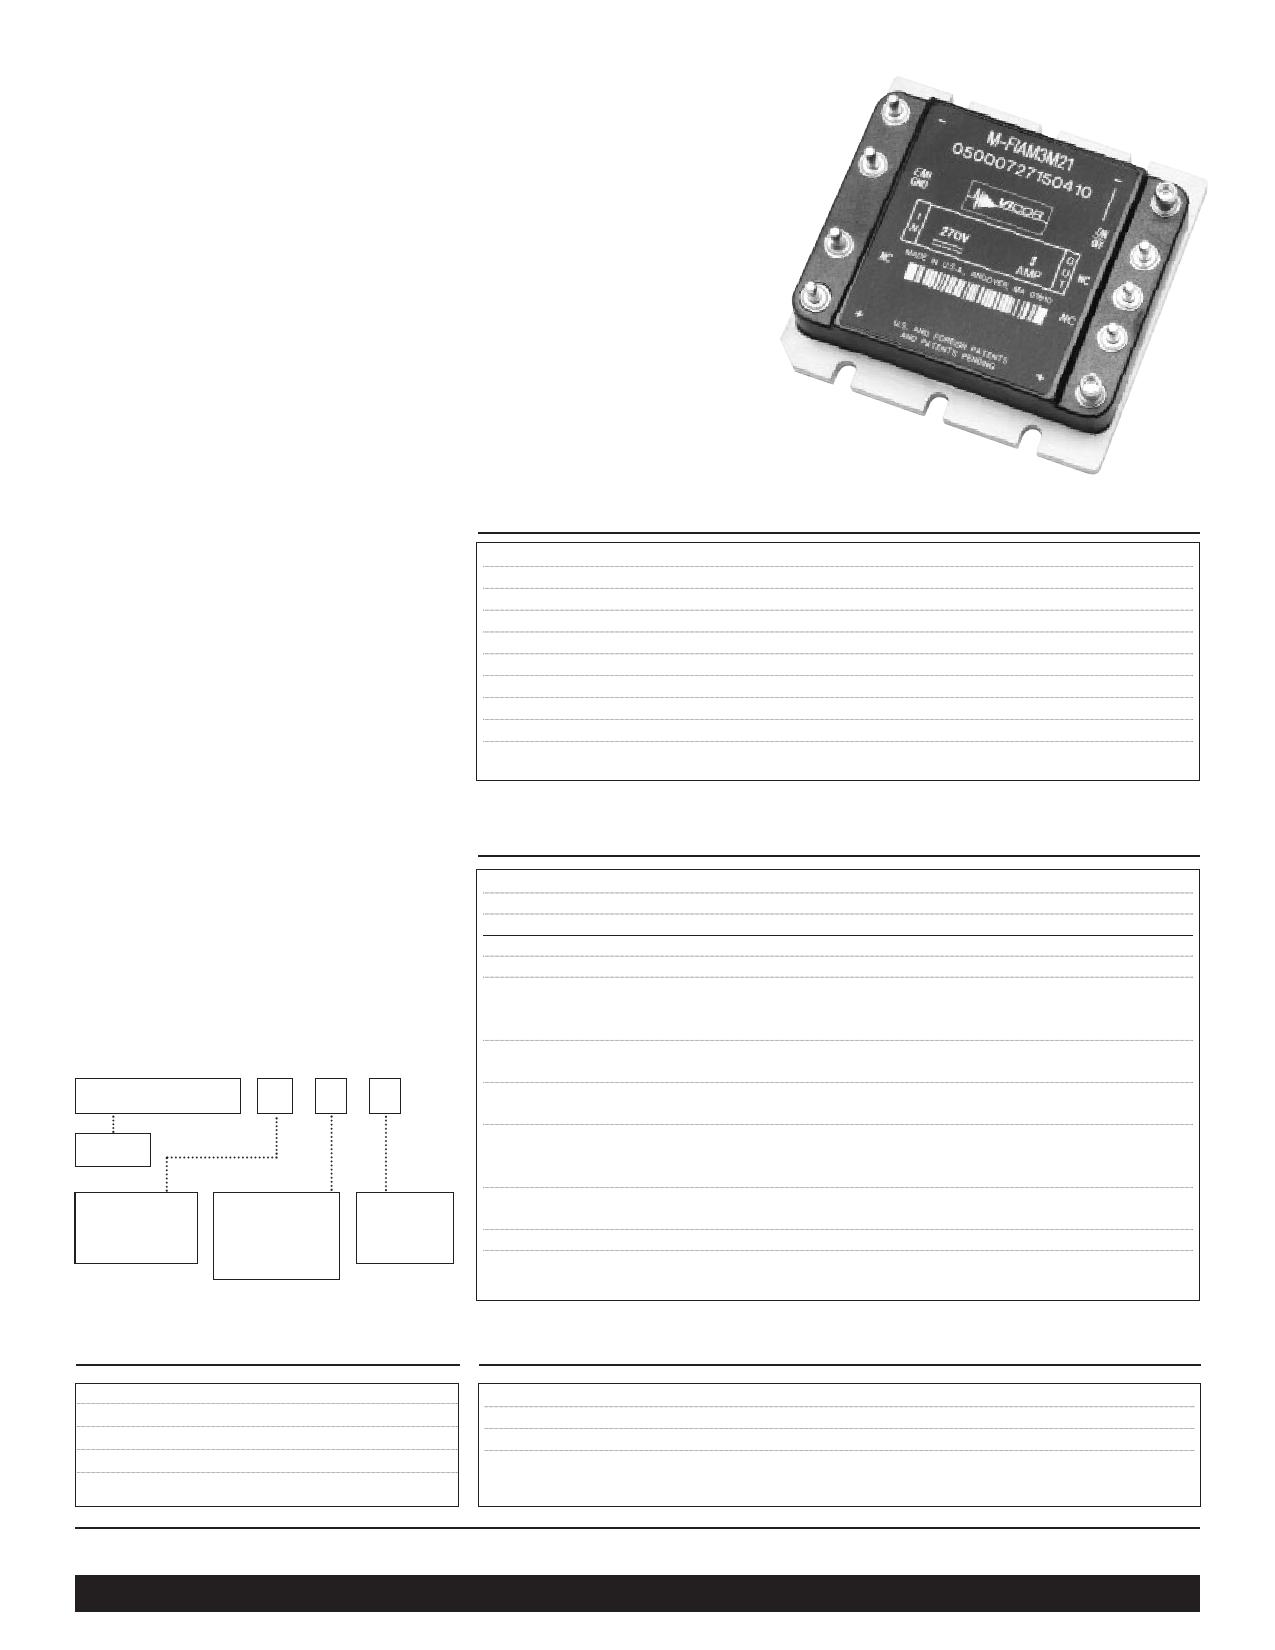 M-FIAM3MS1 datasheet